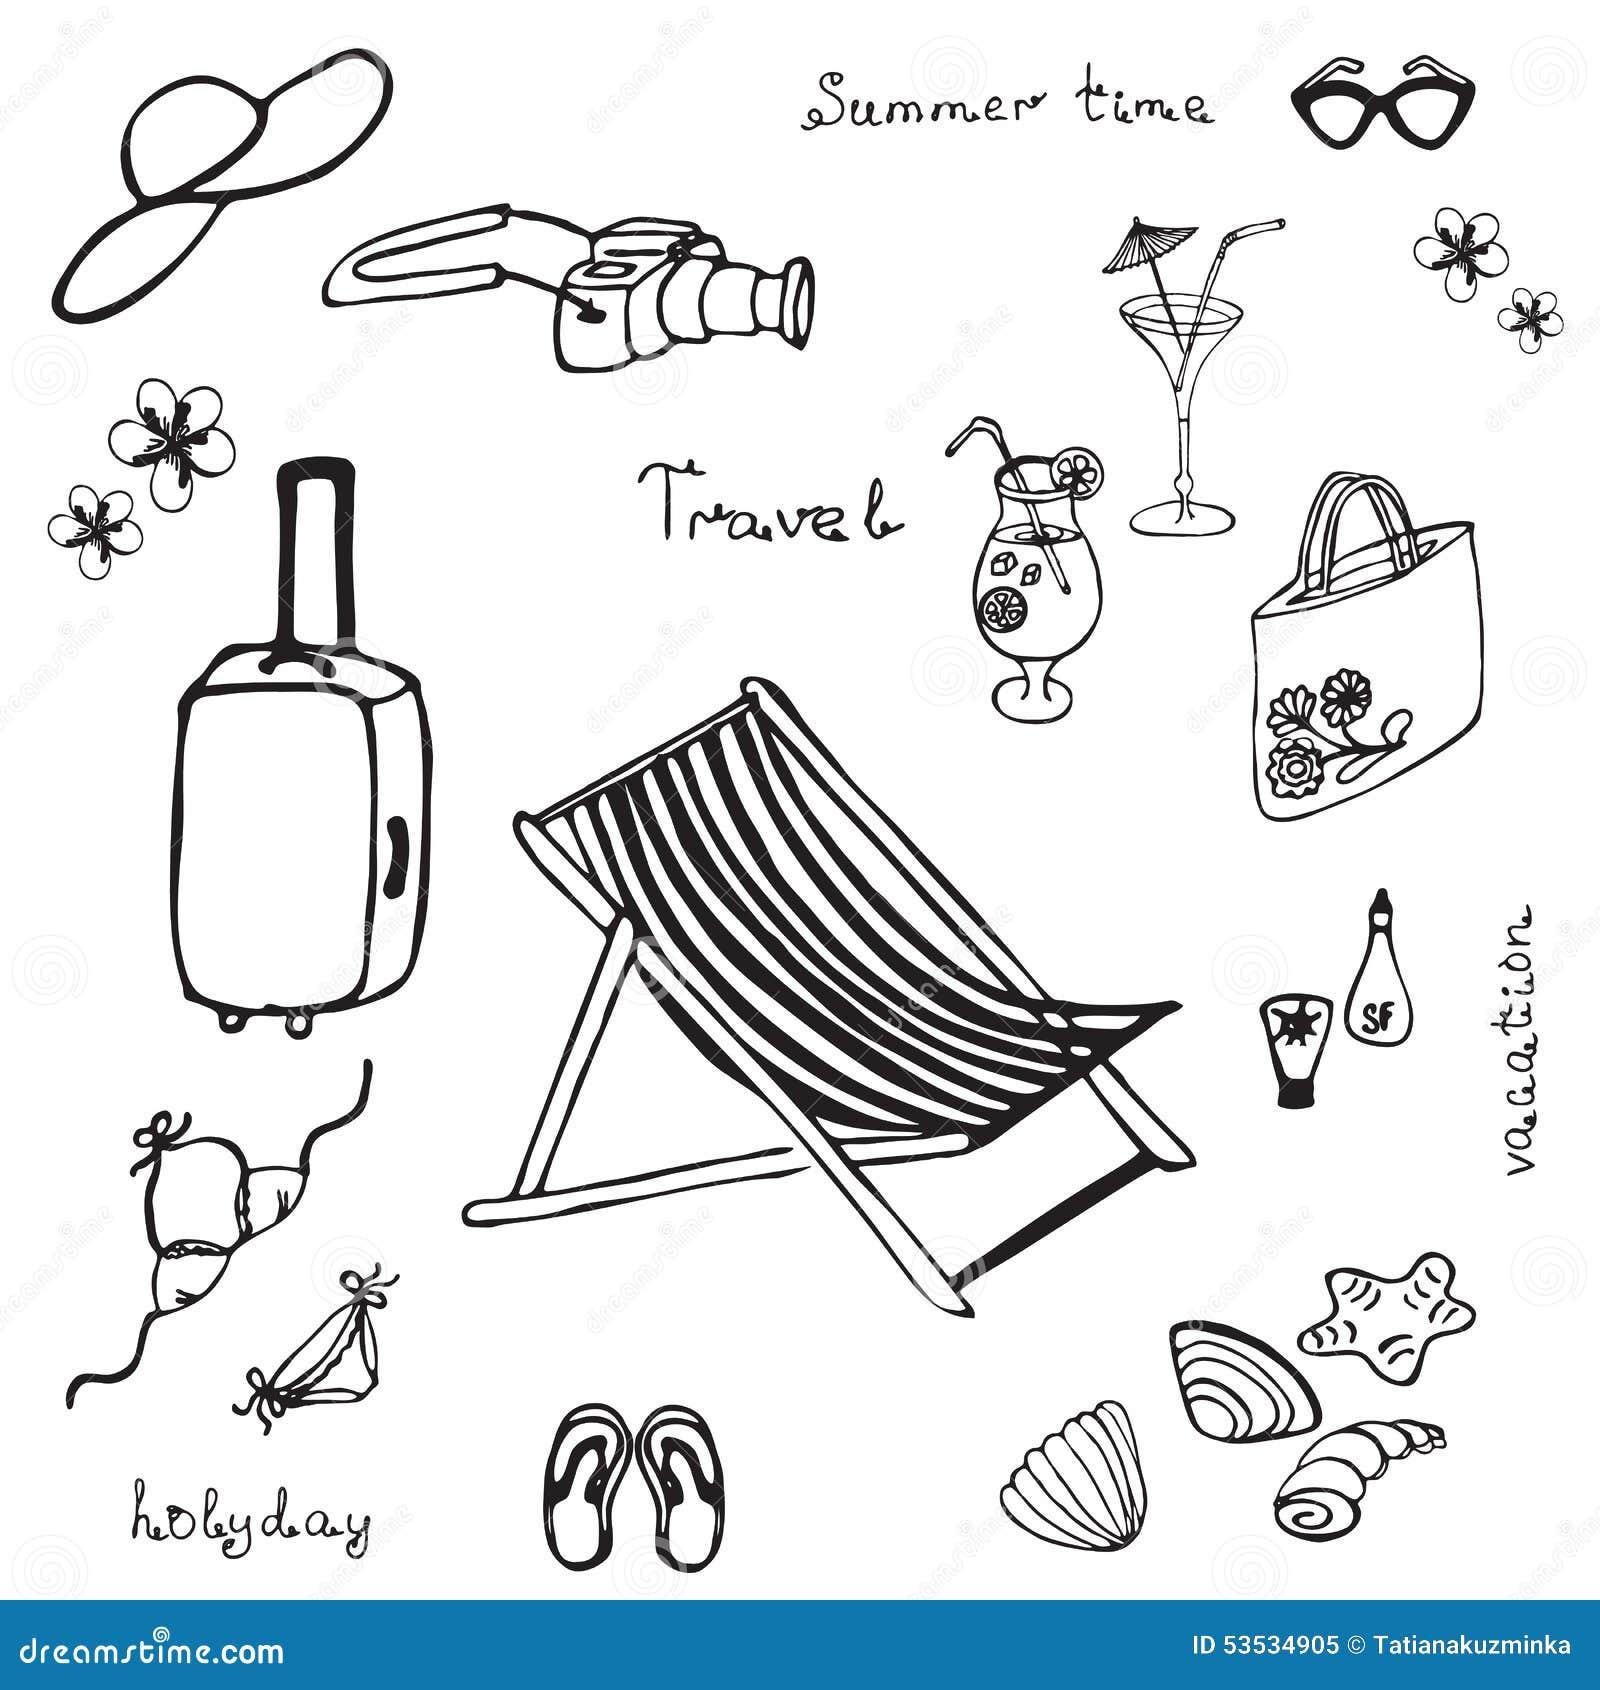 Beach chair and umbrella sketch - Hand Drawn Summer Beach Set Royalty Free Stock Photo